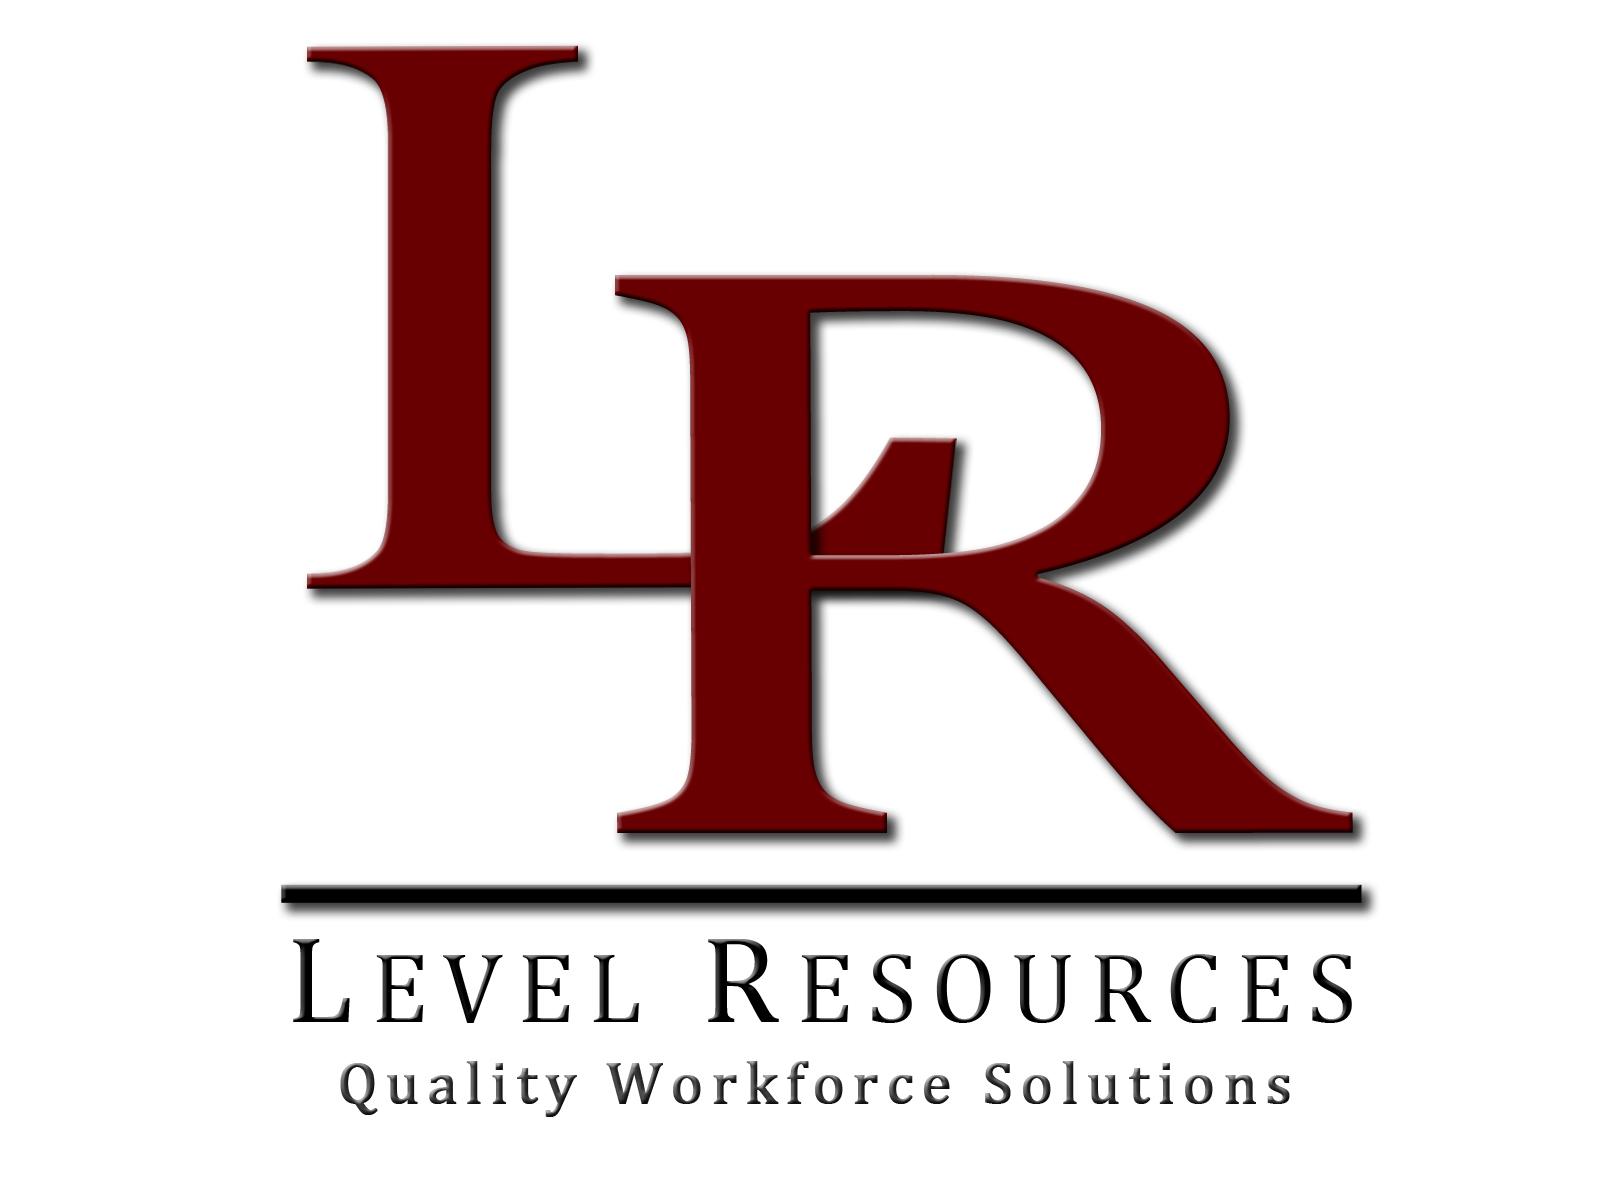 Level Resources